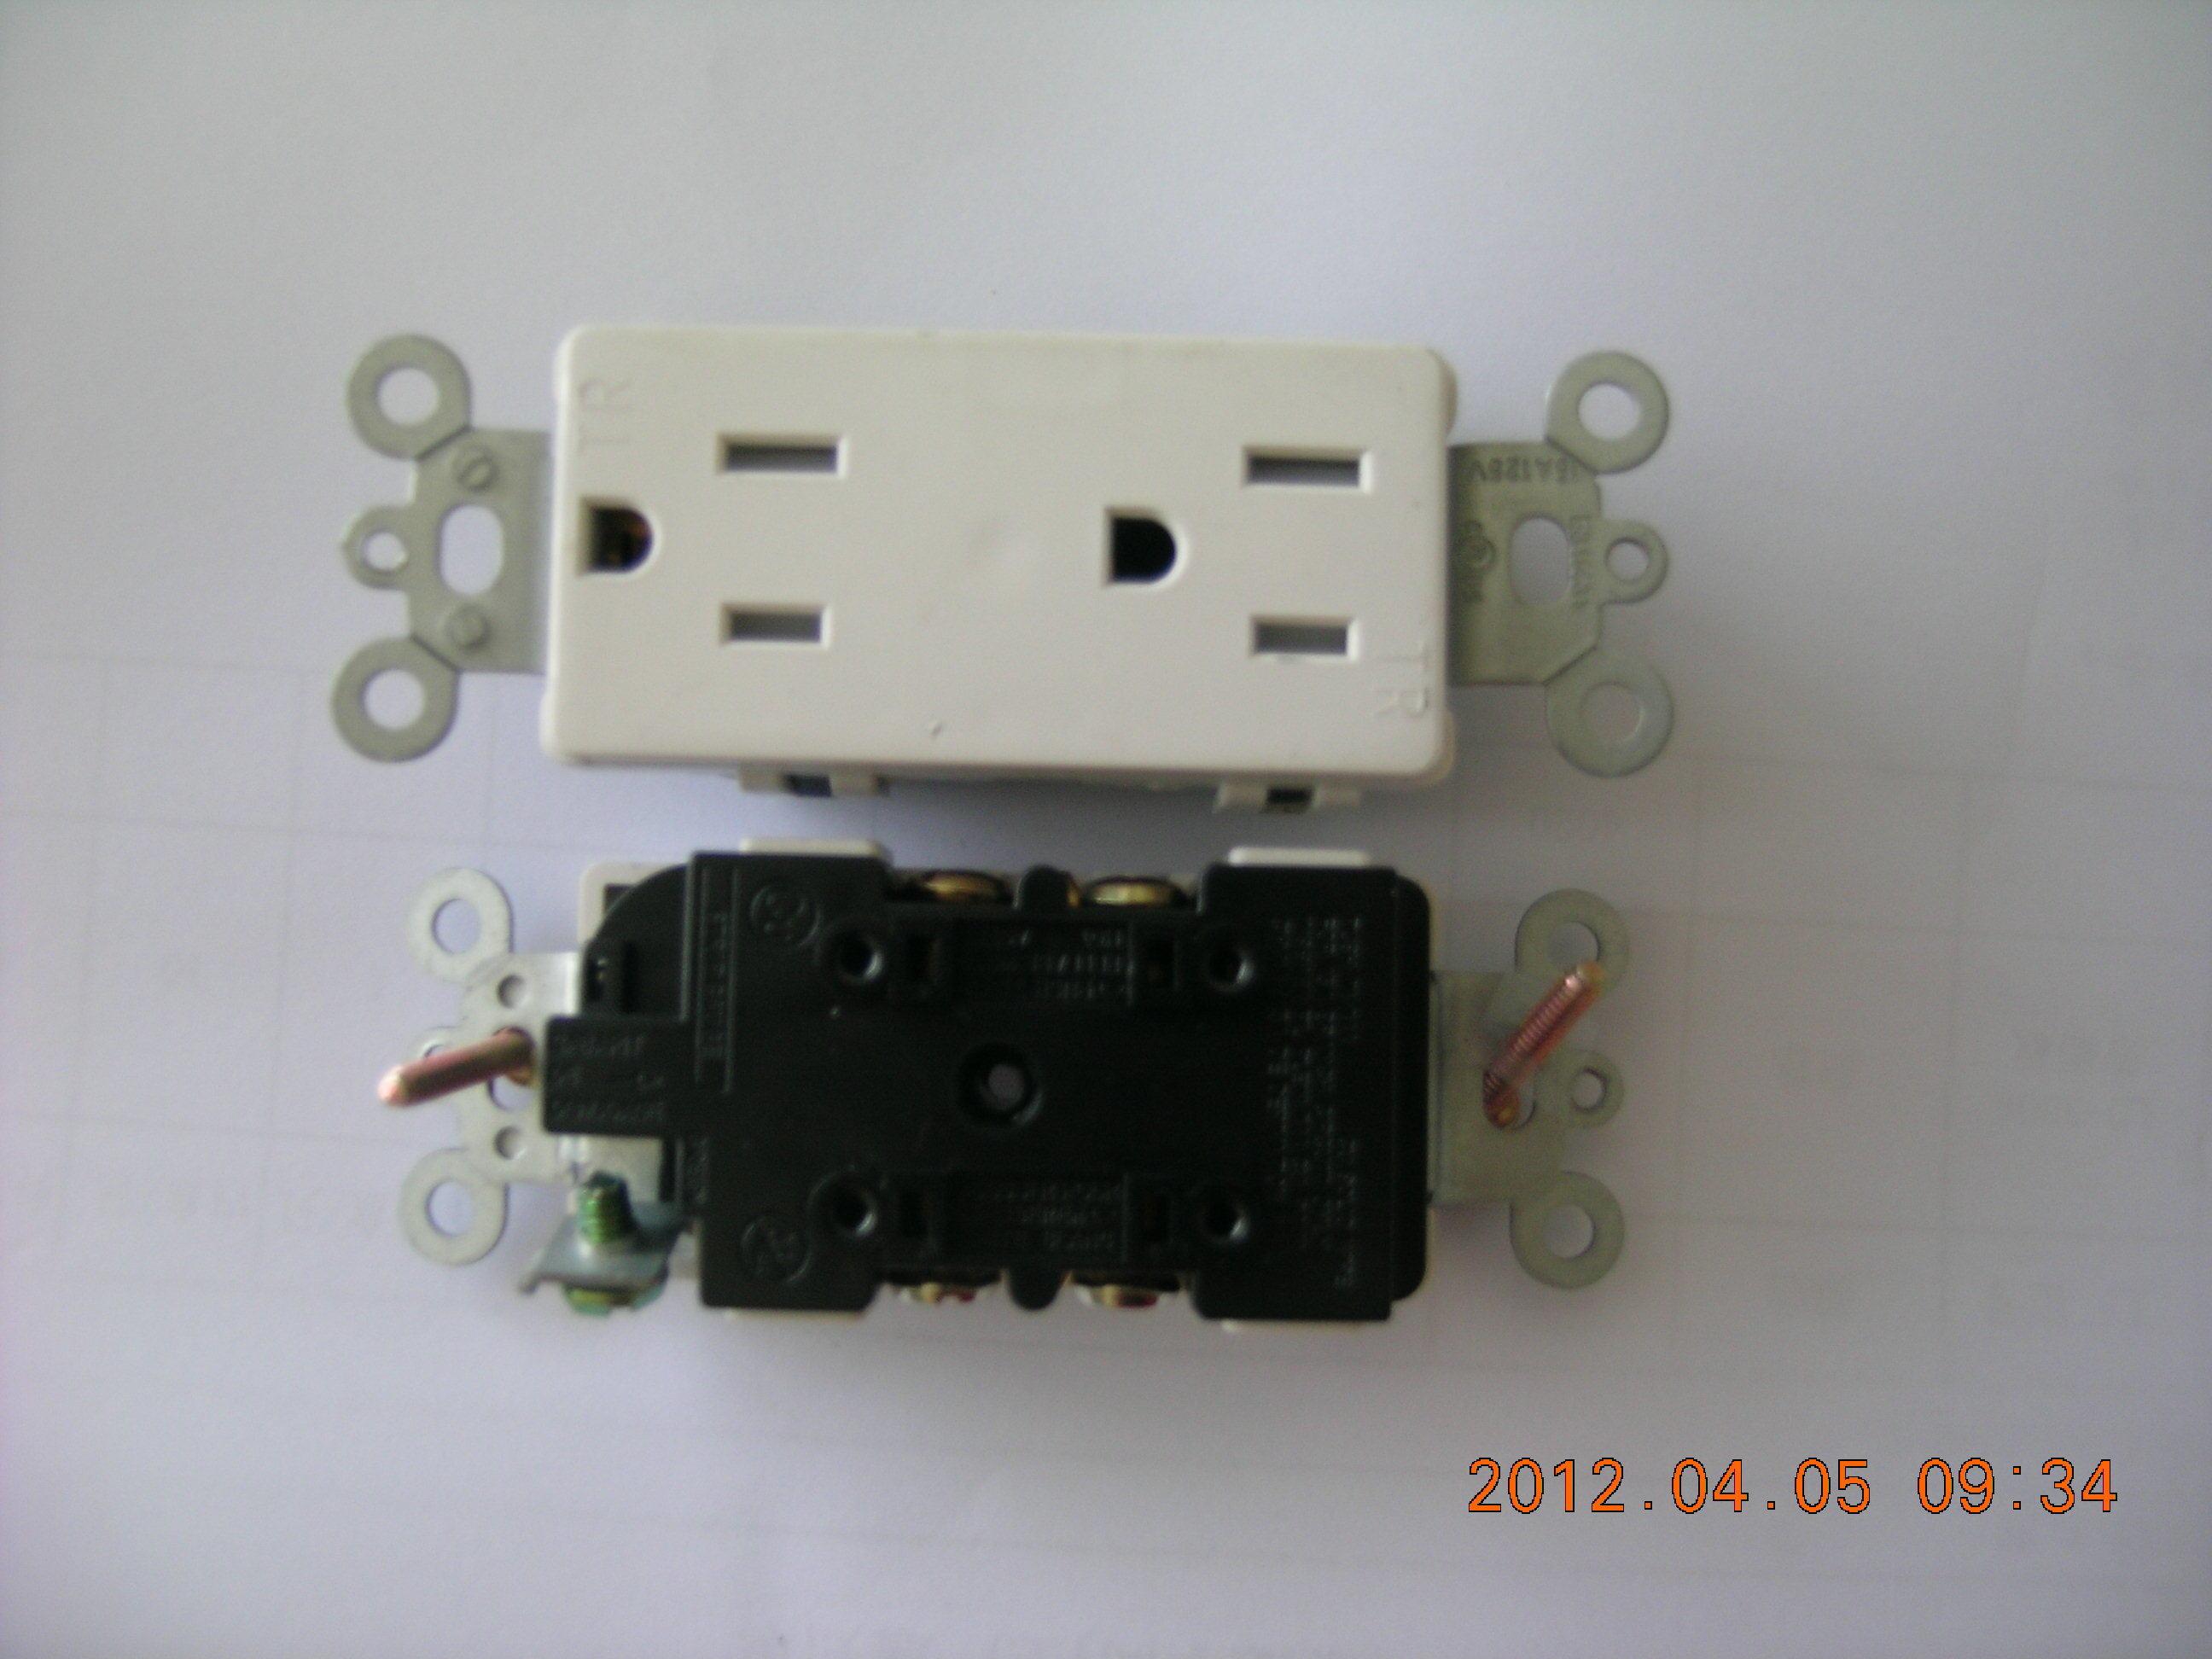 UL, Tamper-Resistant, Decora Plus Duplex Electrical Receptacle